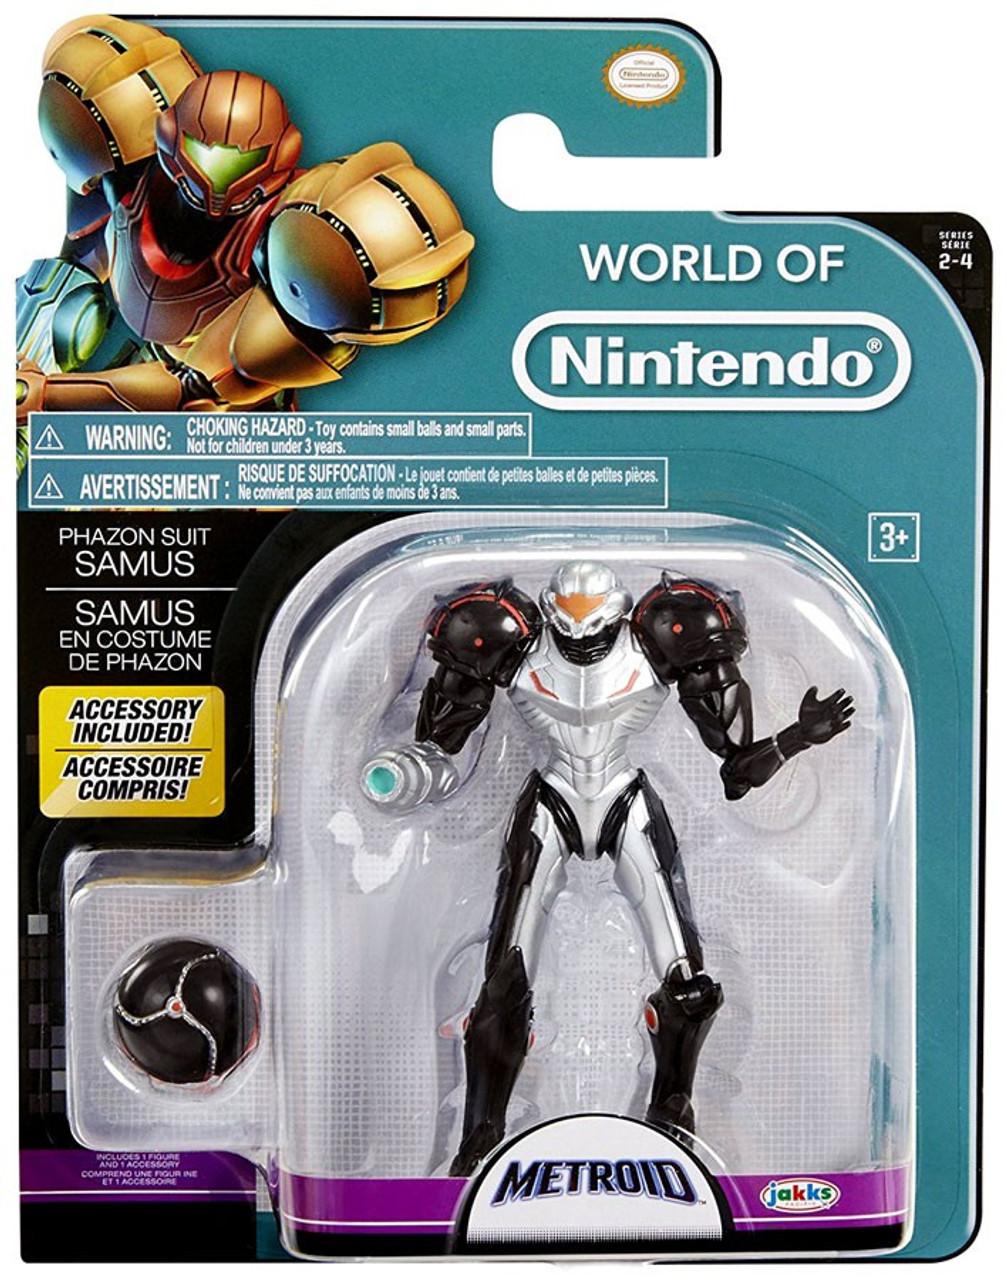 World Of Nintendo Metroid Series 2 4 Phazon Suit Samus Action Figure